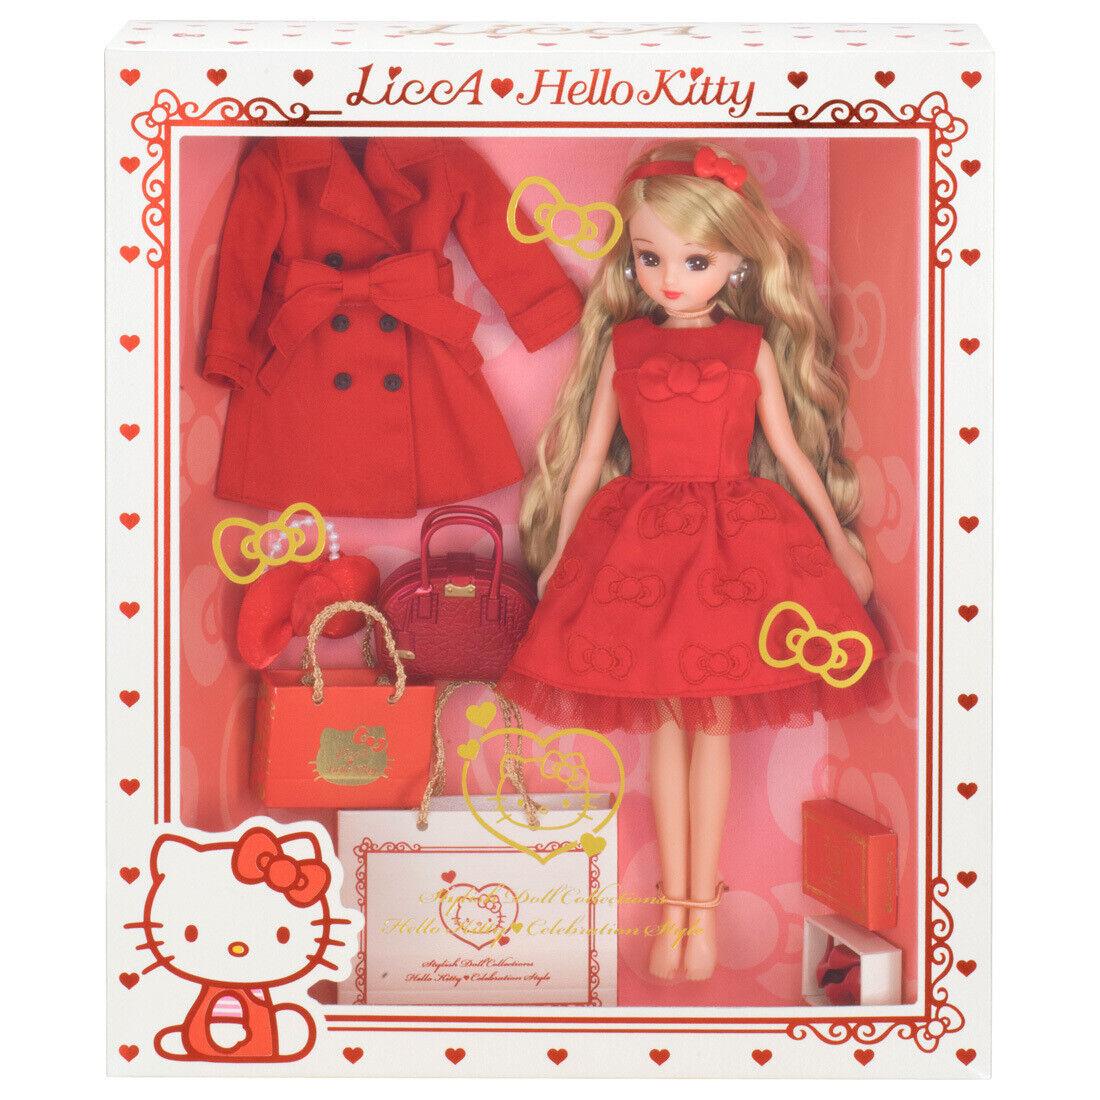 Takara Licca Hello Kitty SANRIO Celebration Style Rika stylish doll collection